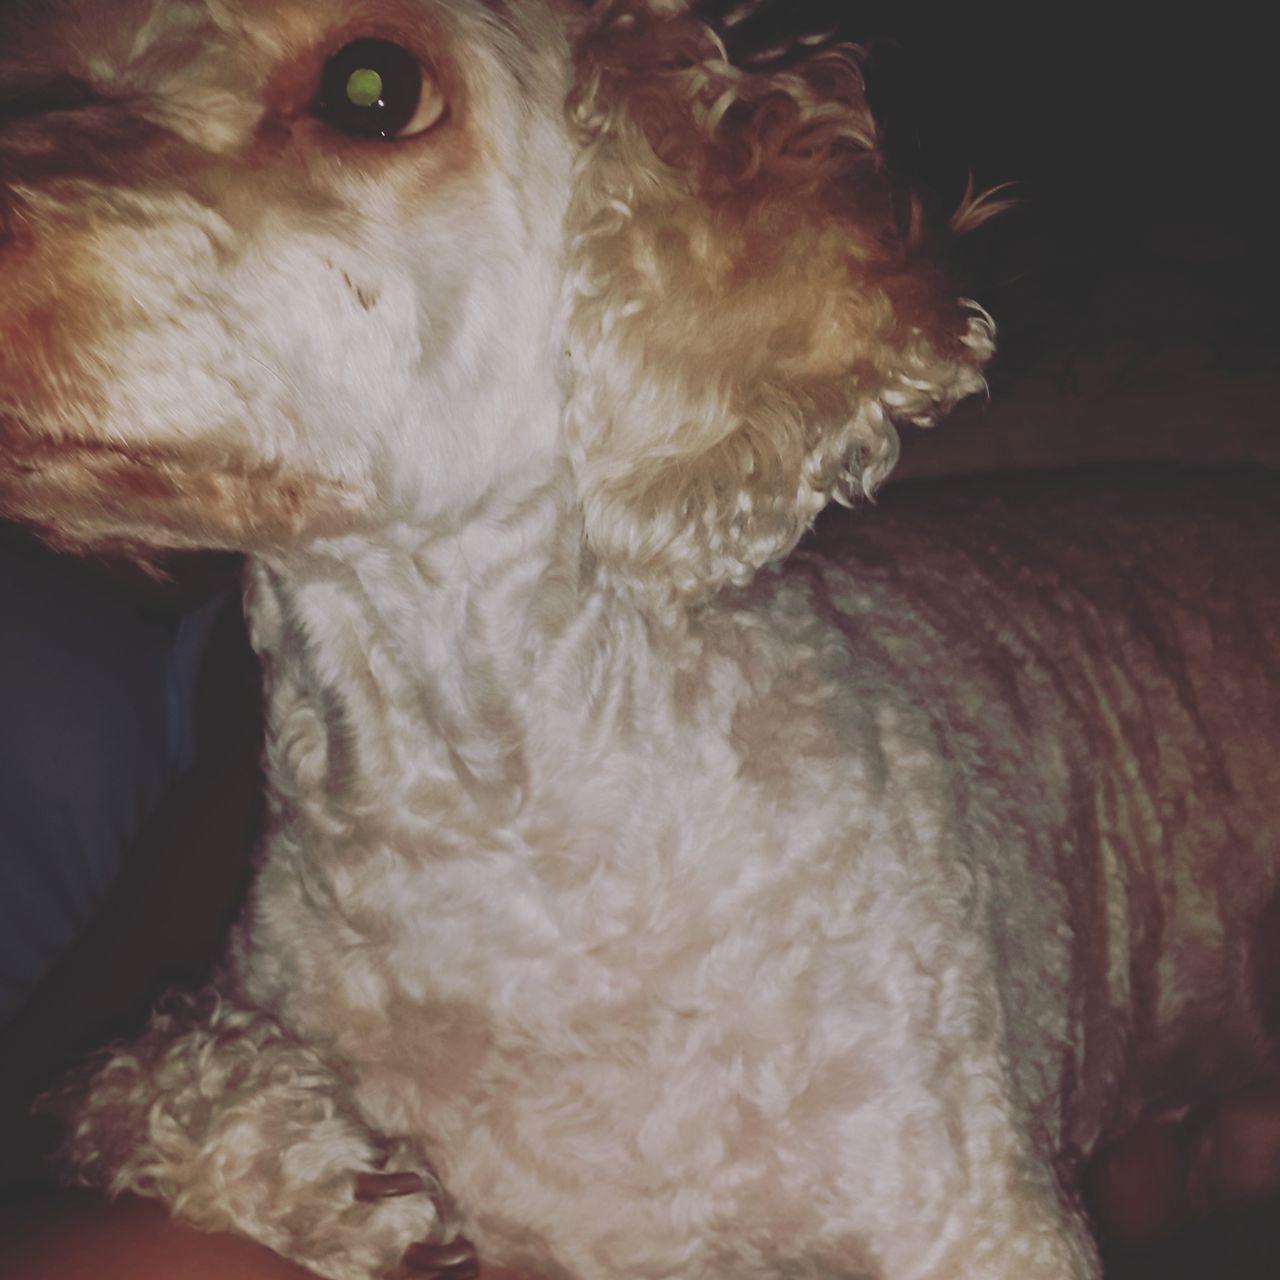 Roca my love ✌ Dog DogLove Poodle Filter Eyes Beautiful King Life First Eyeem Photo